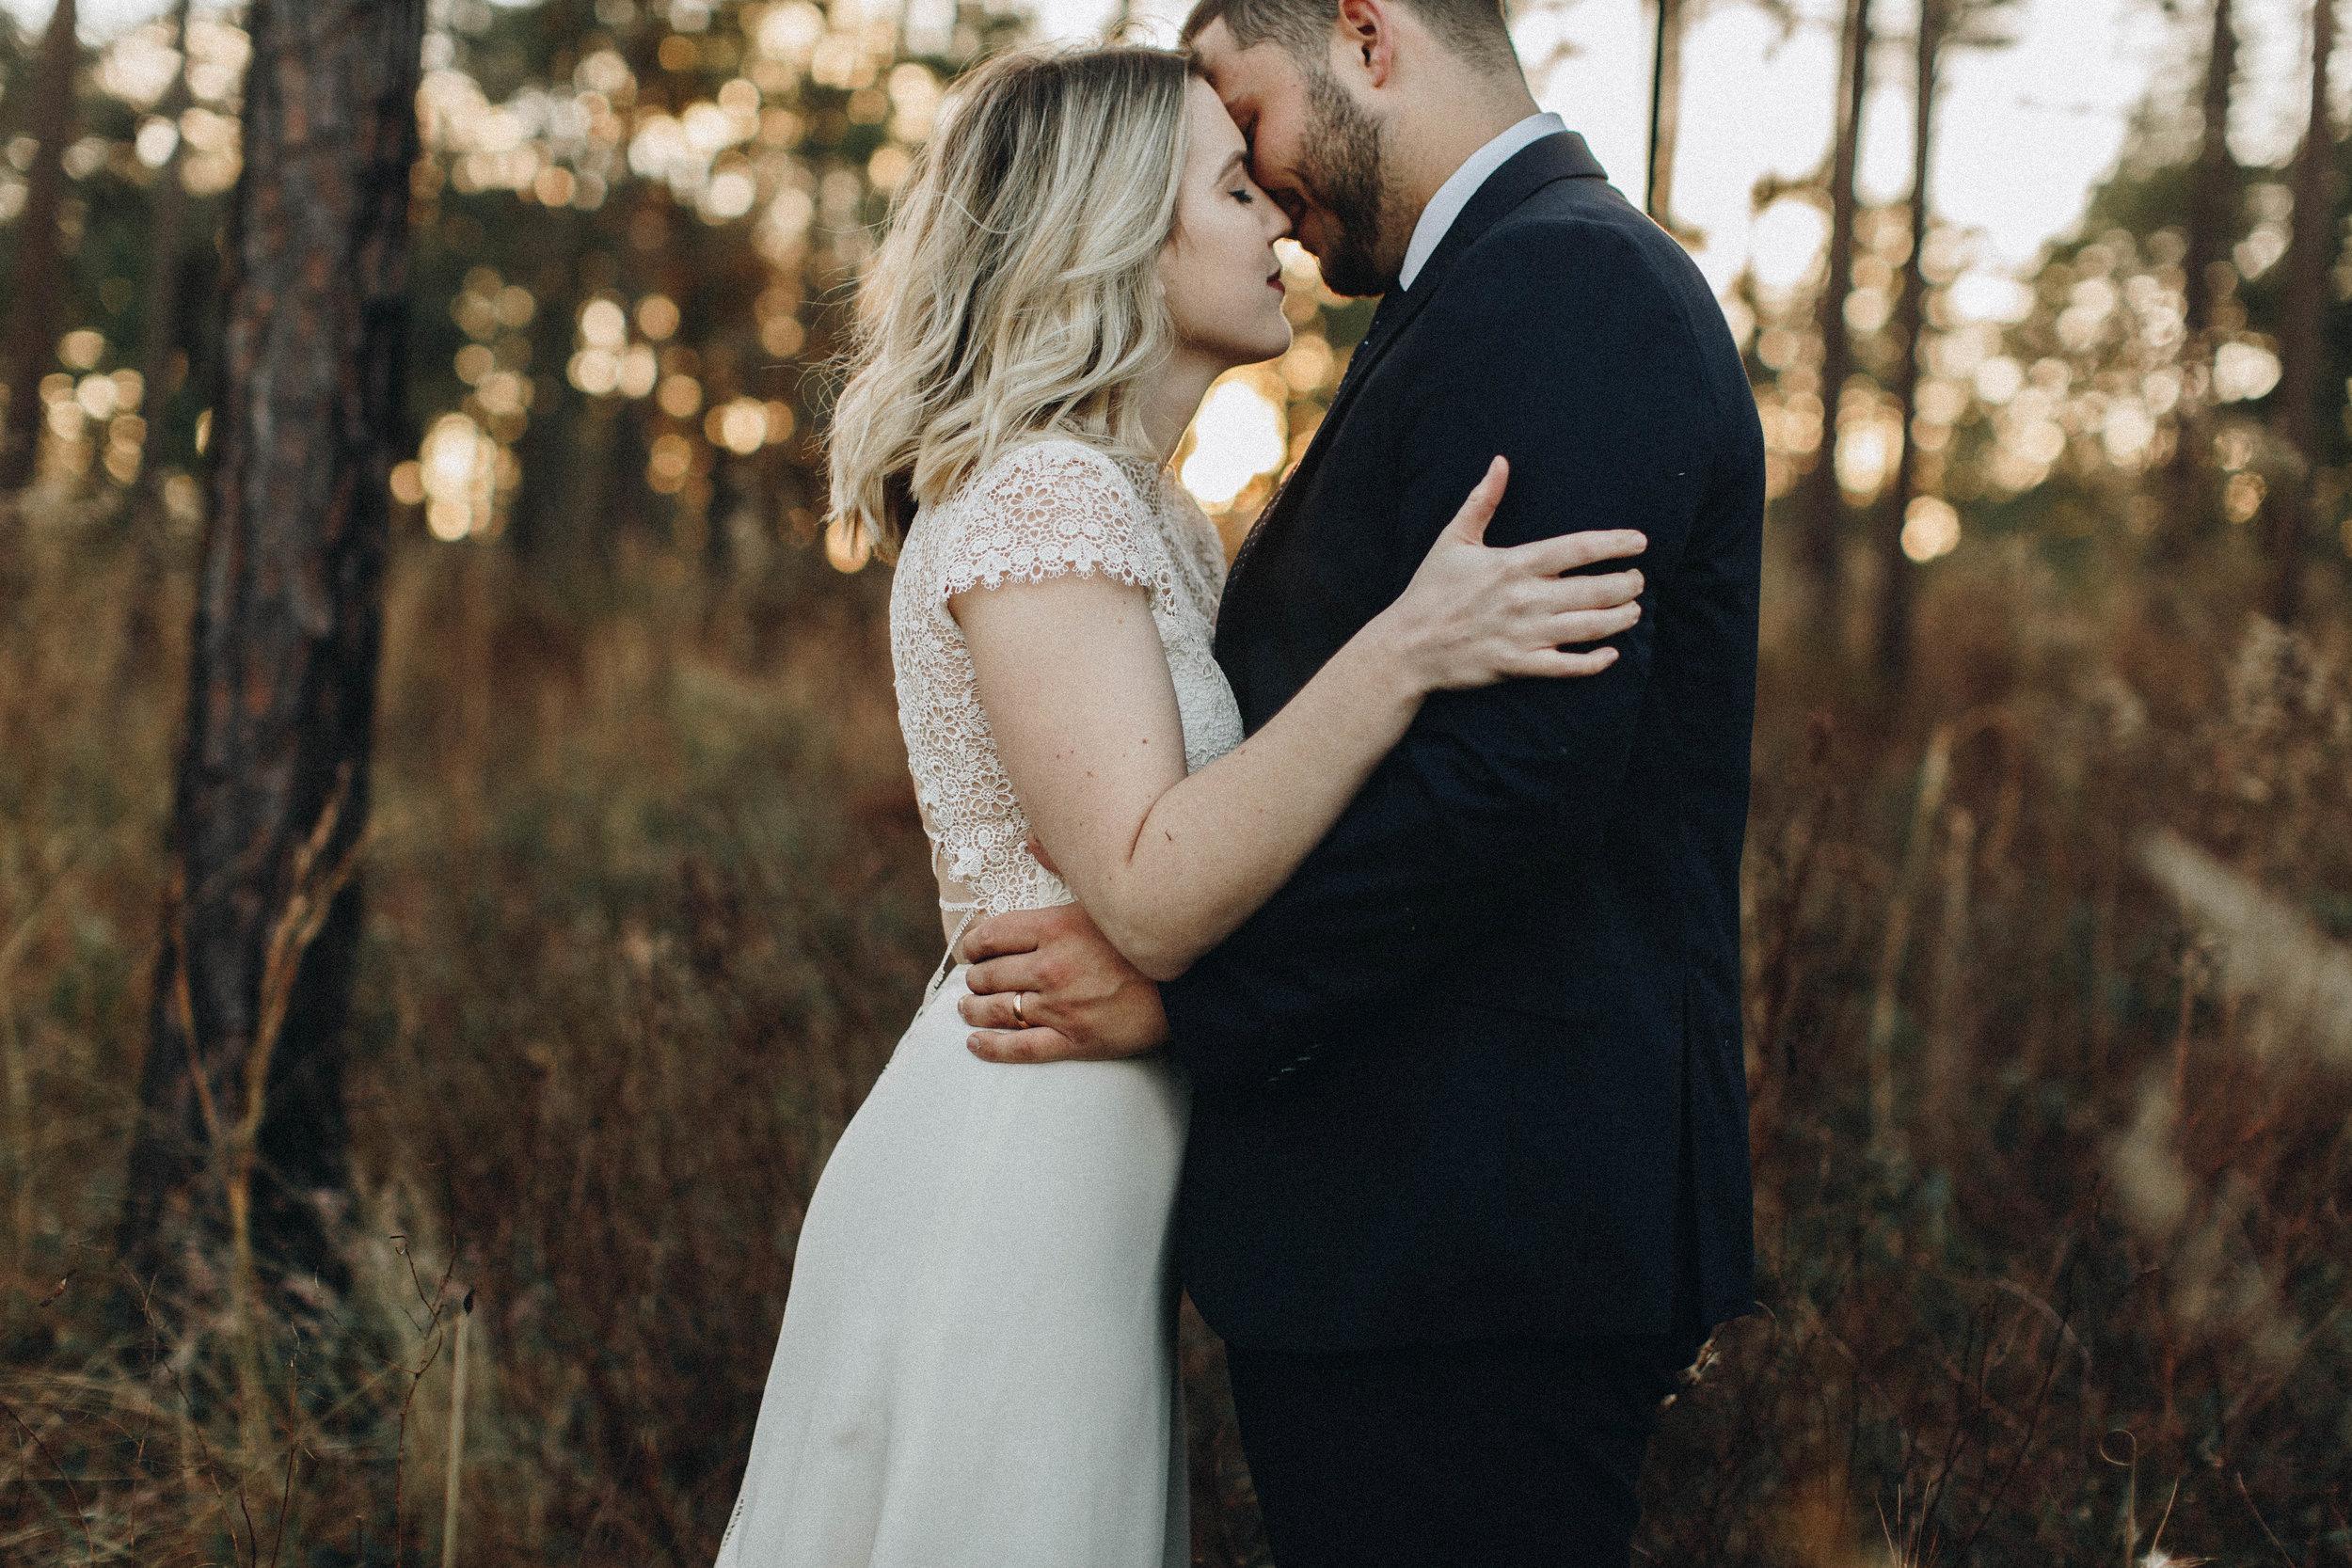 Orlando+wedding+photographer-32.jpeg